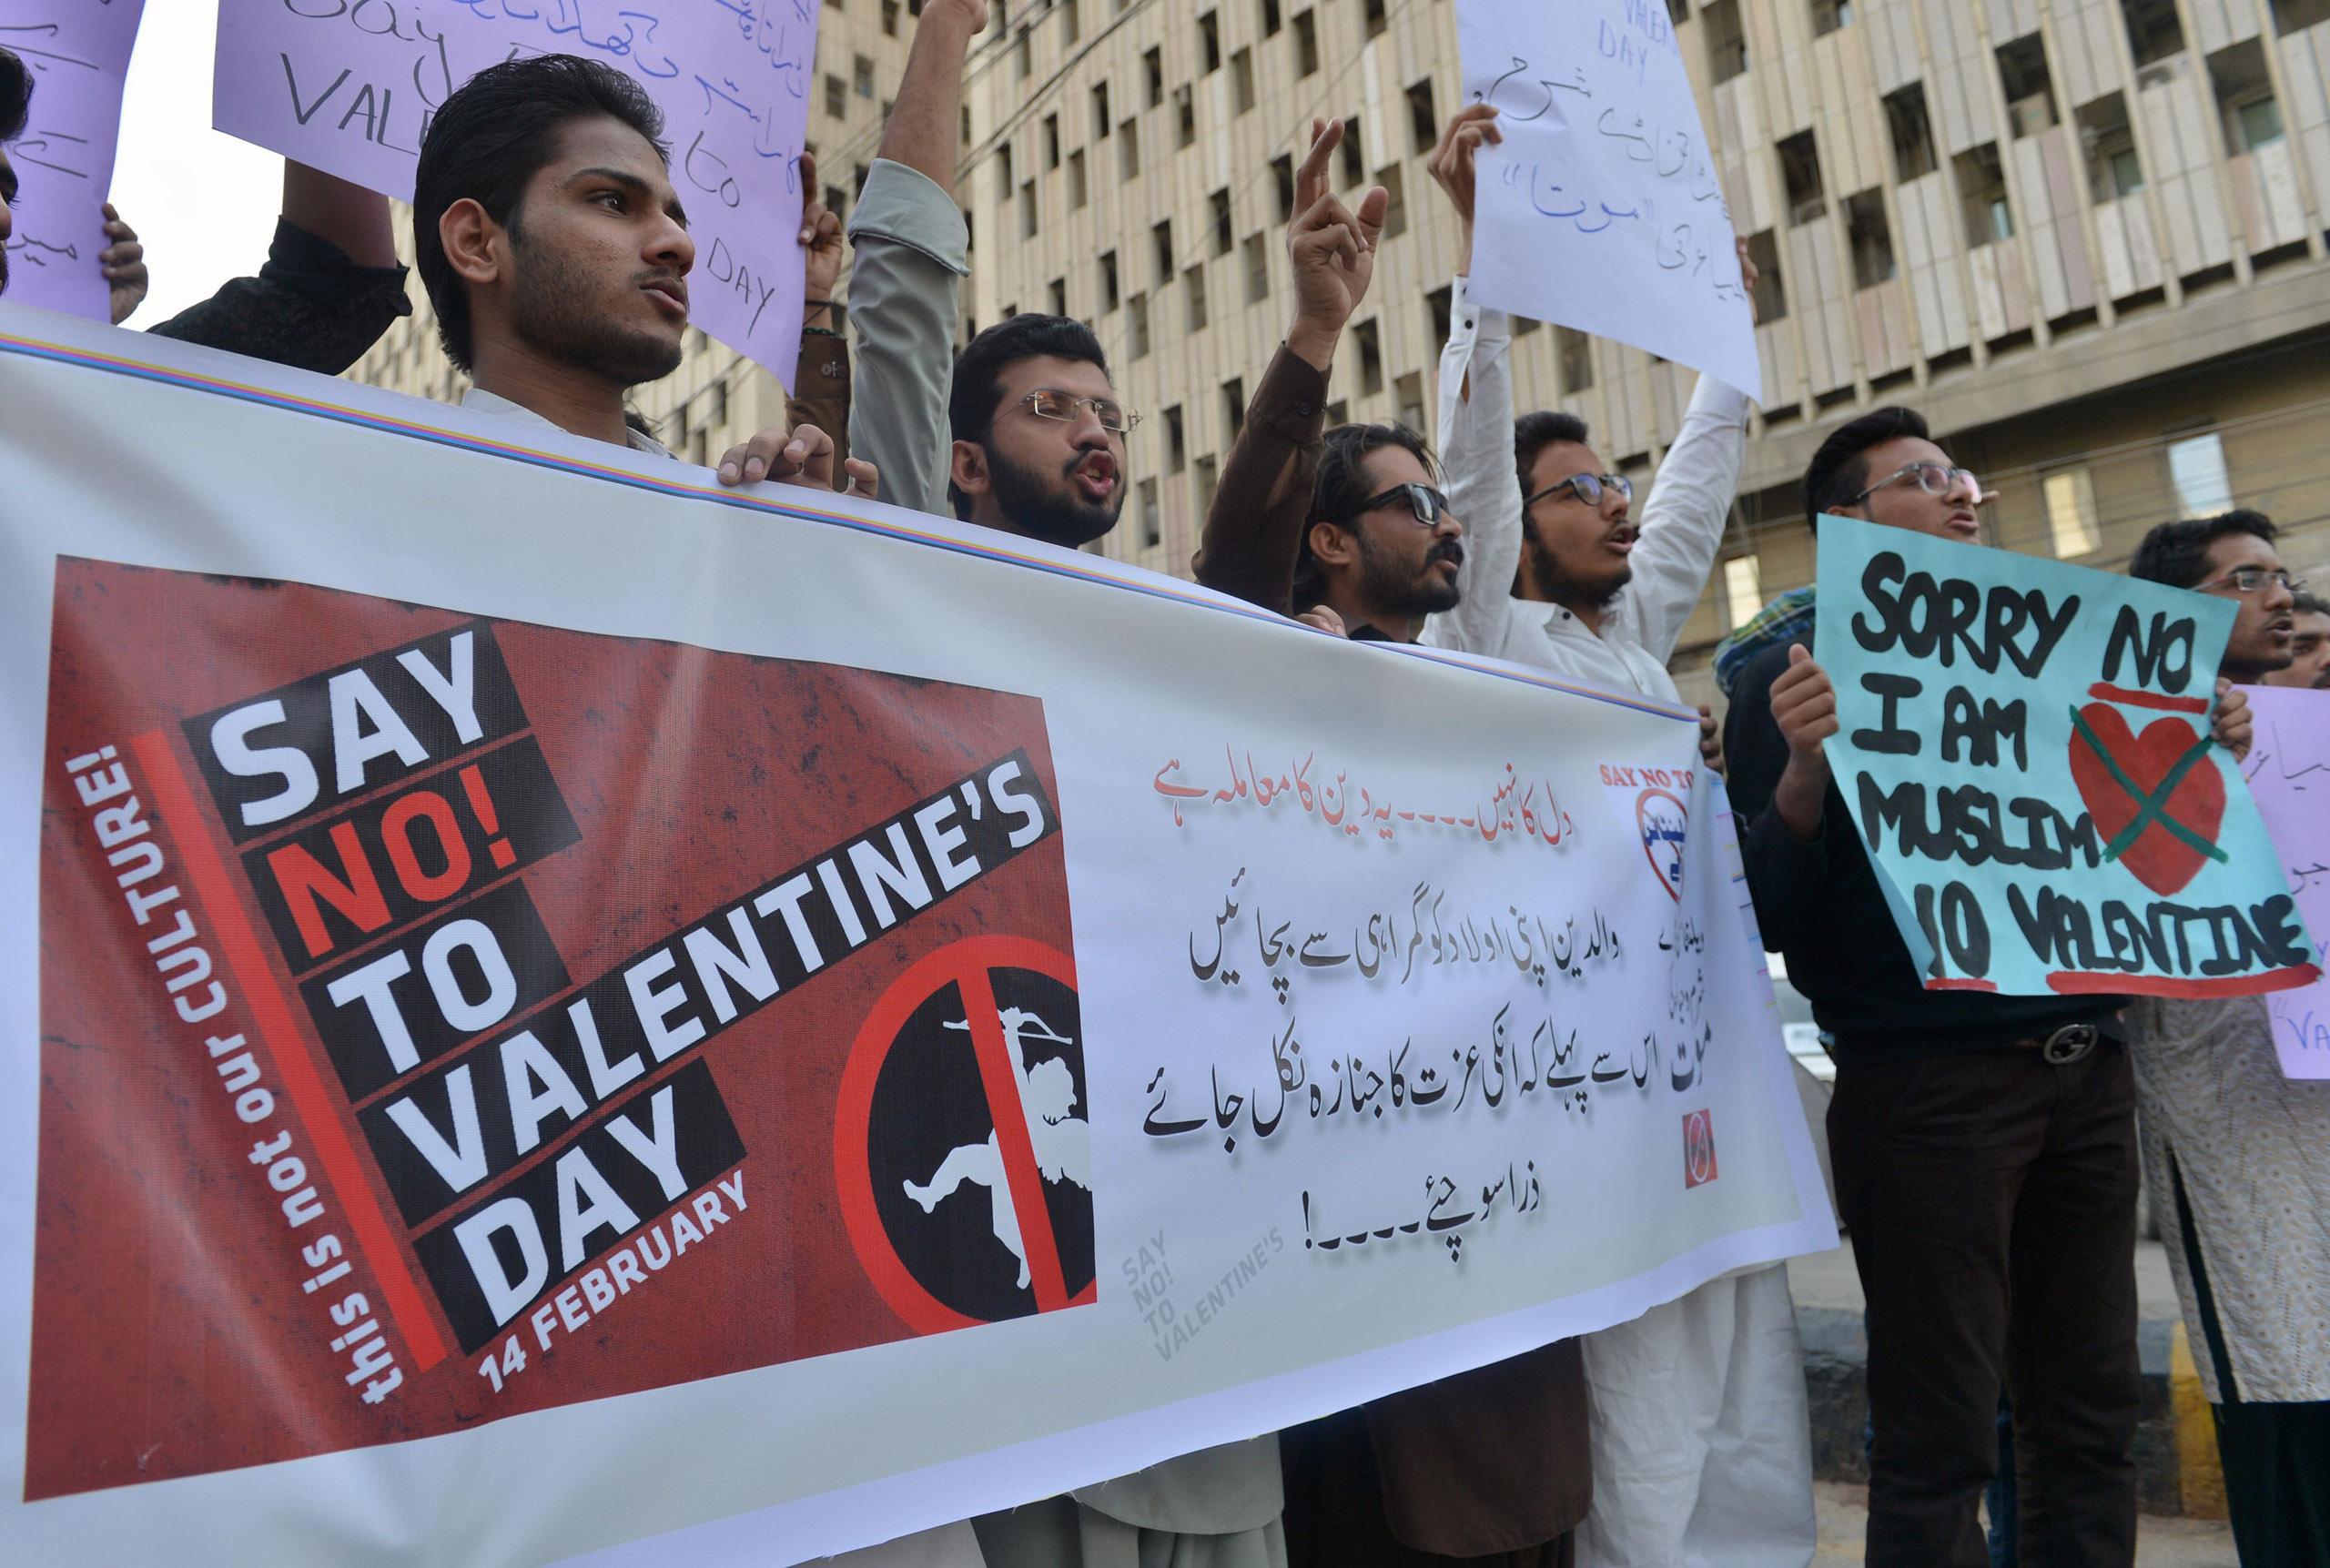 Pakistani men protest against Valentine's Day celebrations in Karachi on Feb. 12, 2017.